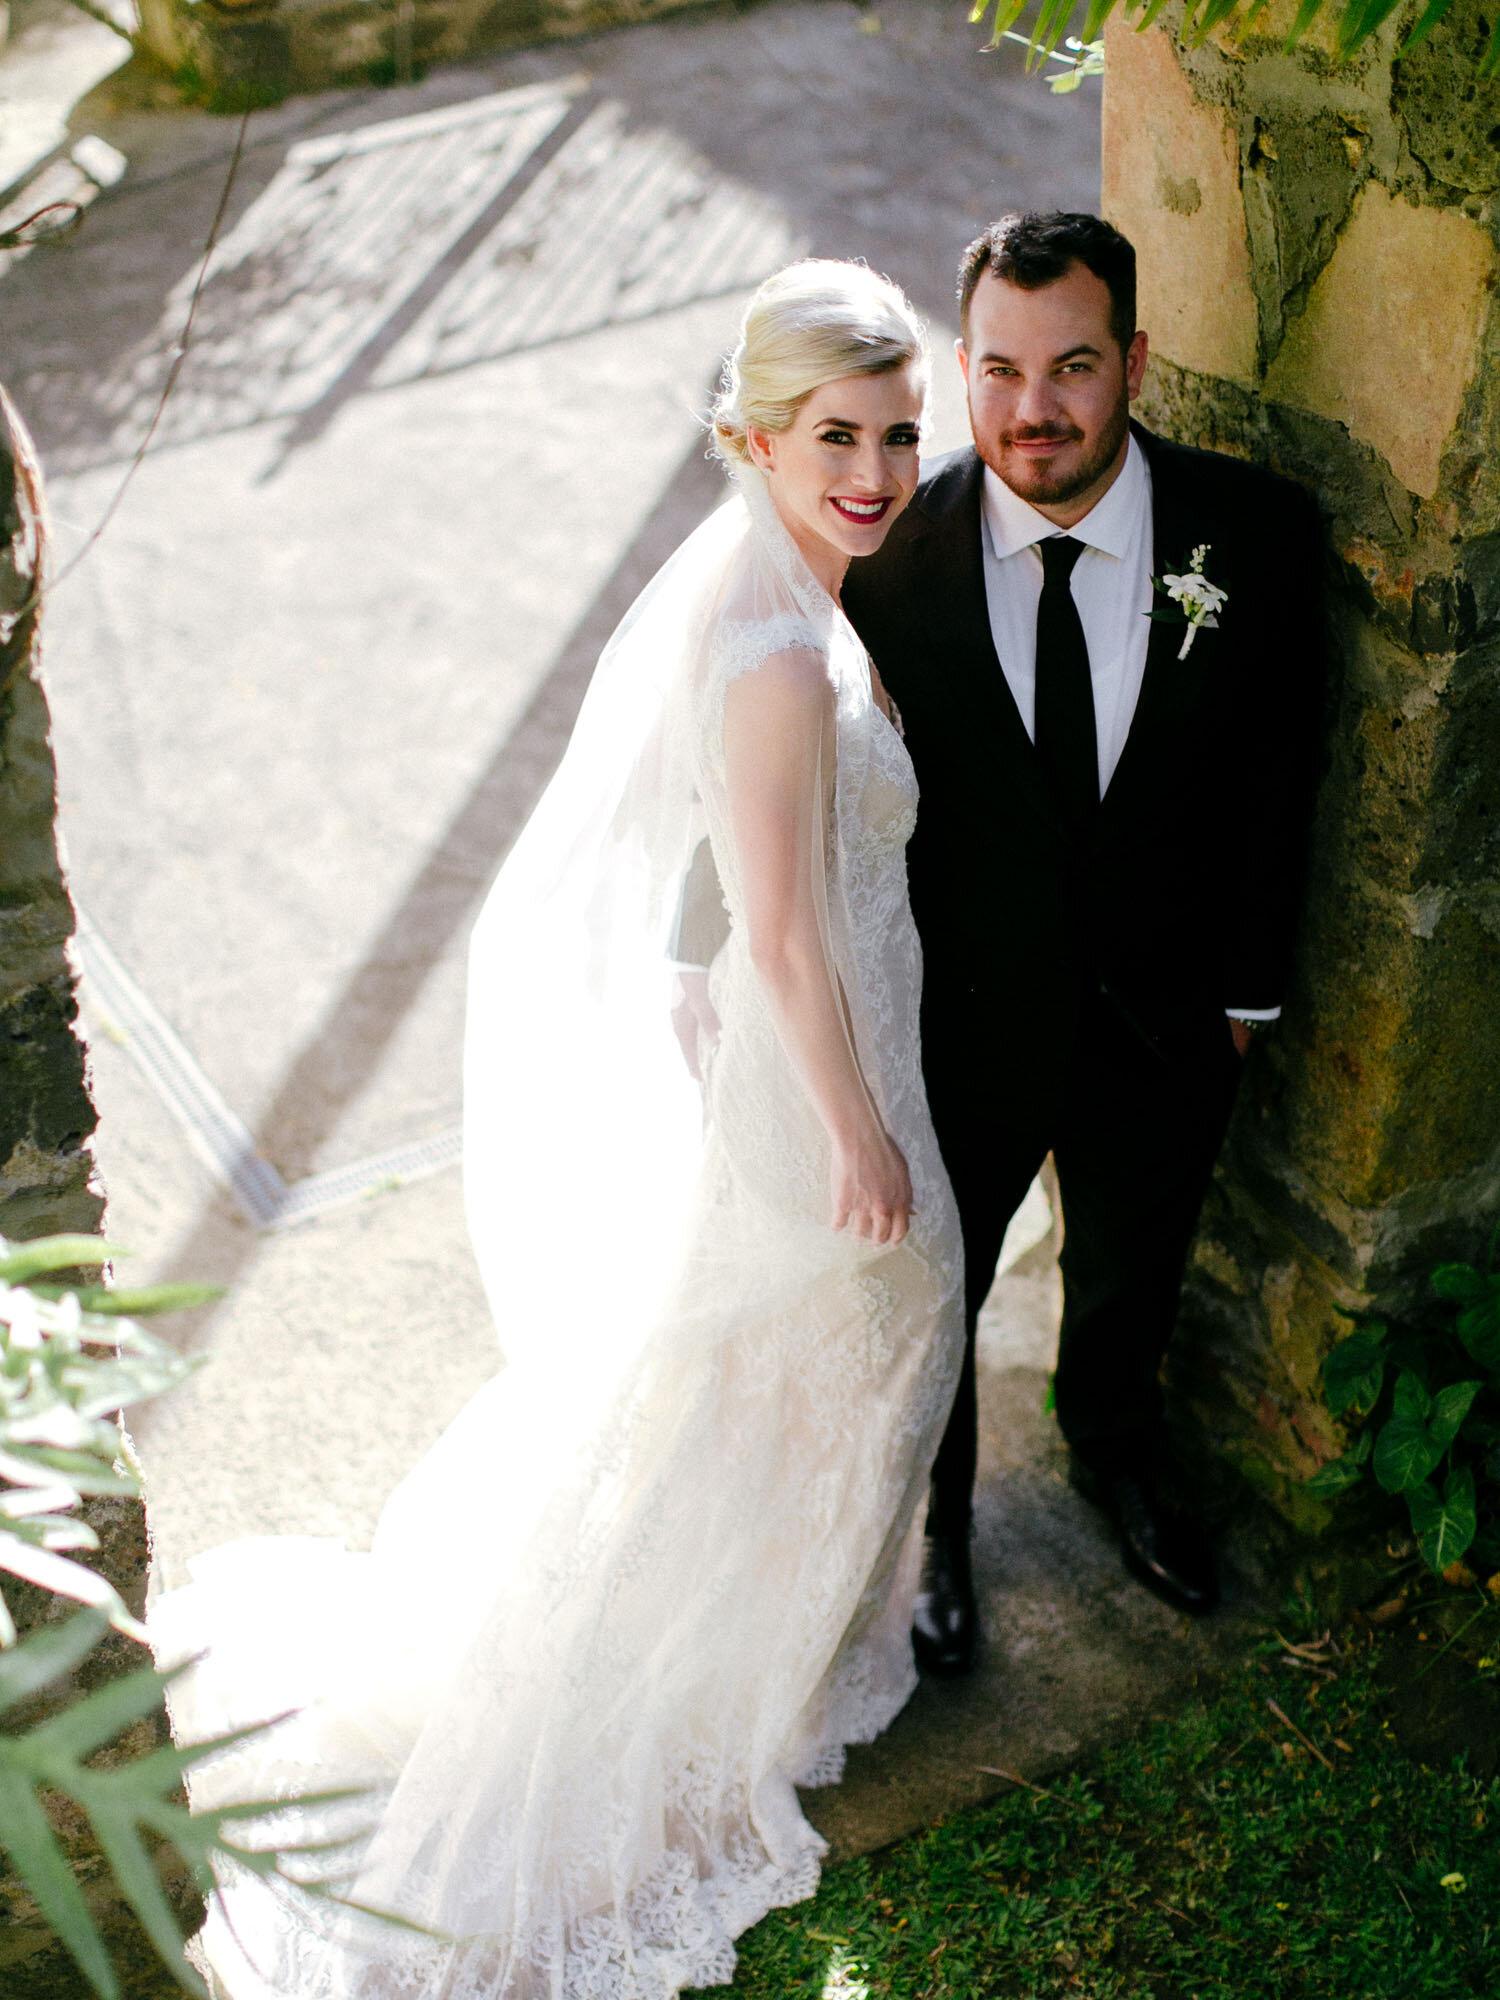 Chris-J-Evans-Maui-Wedding-Kim&Brian3316.jpg